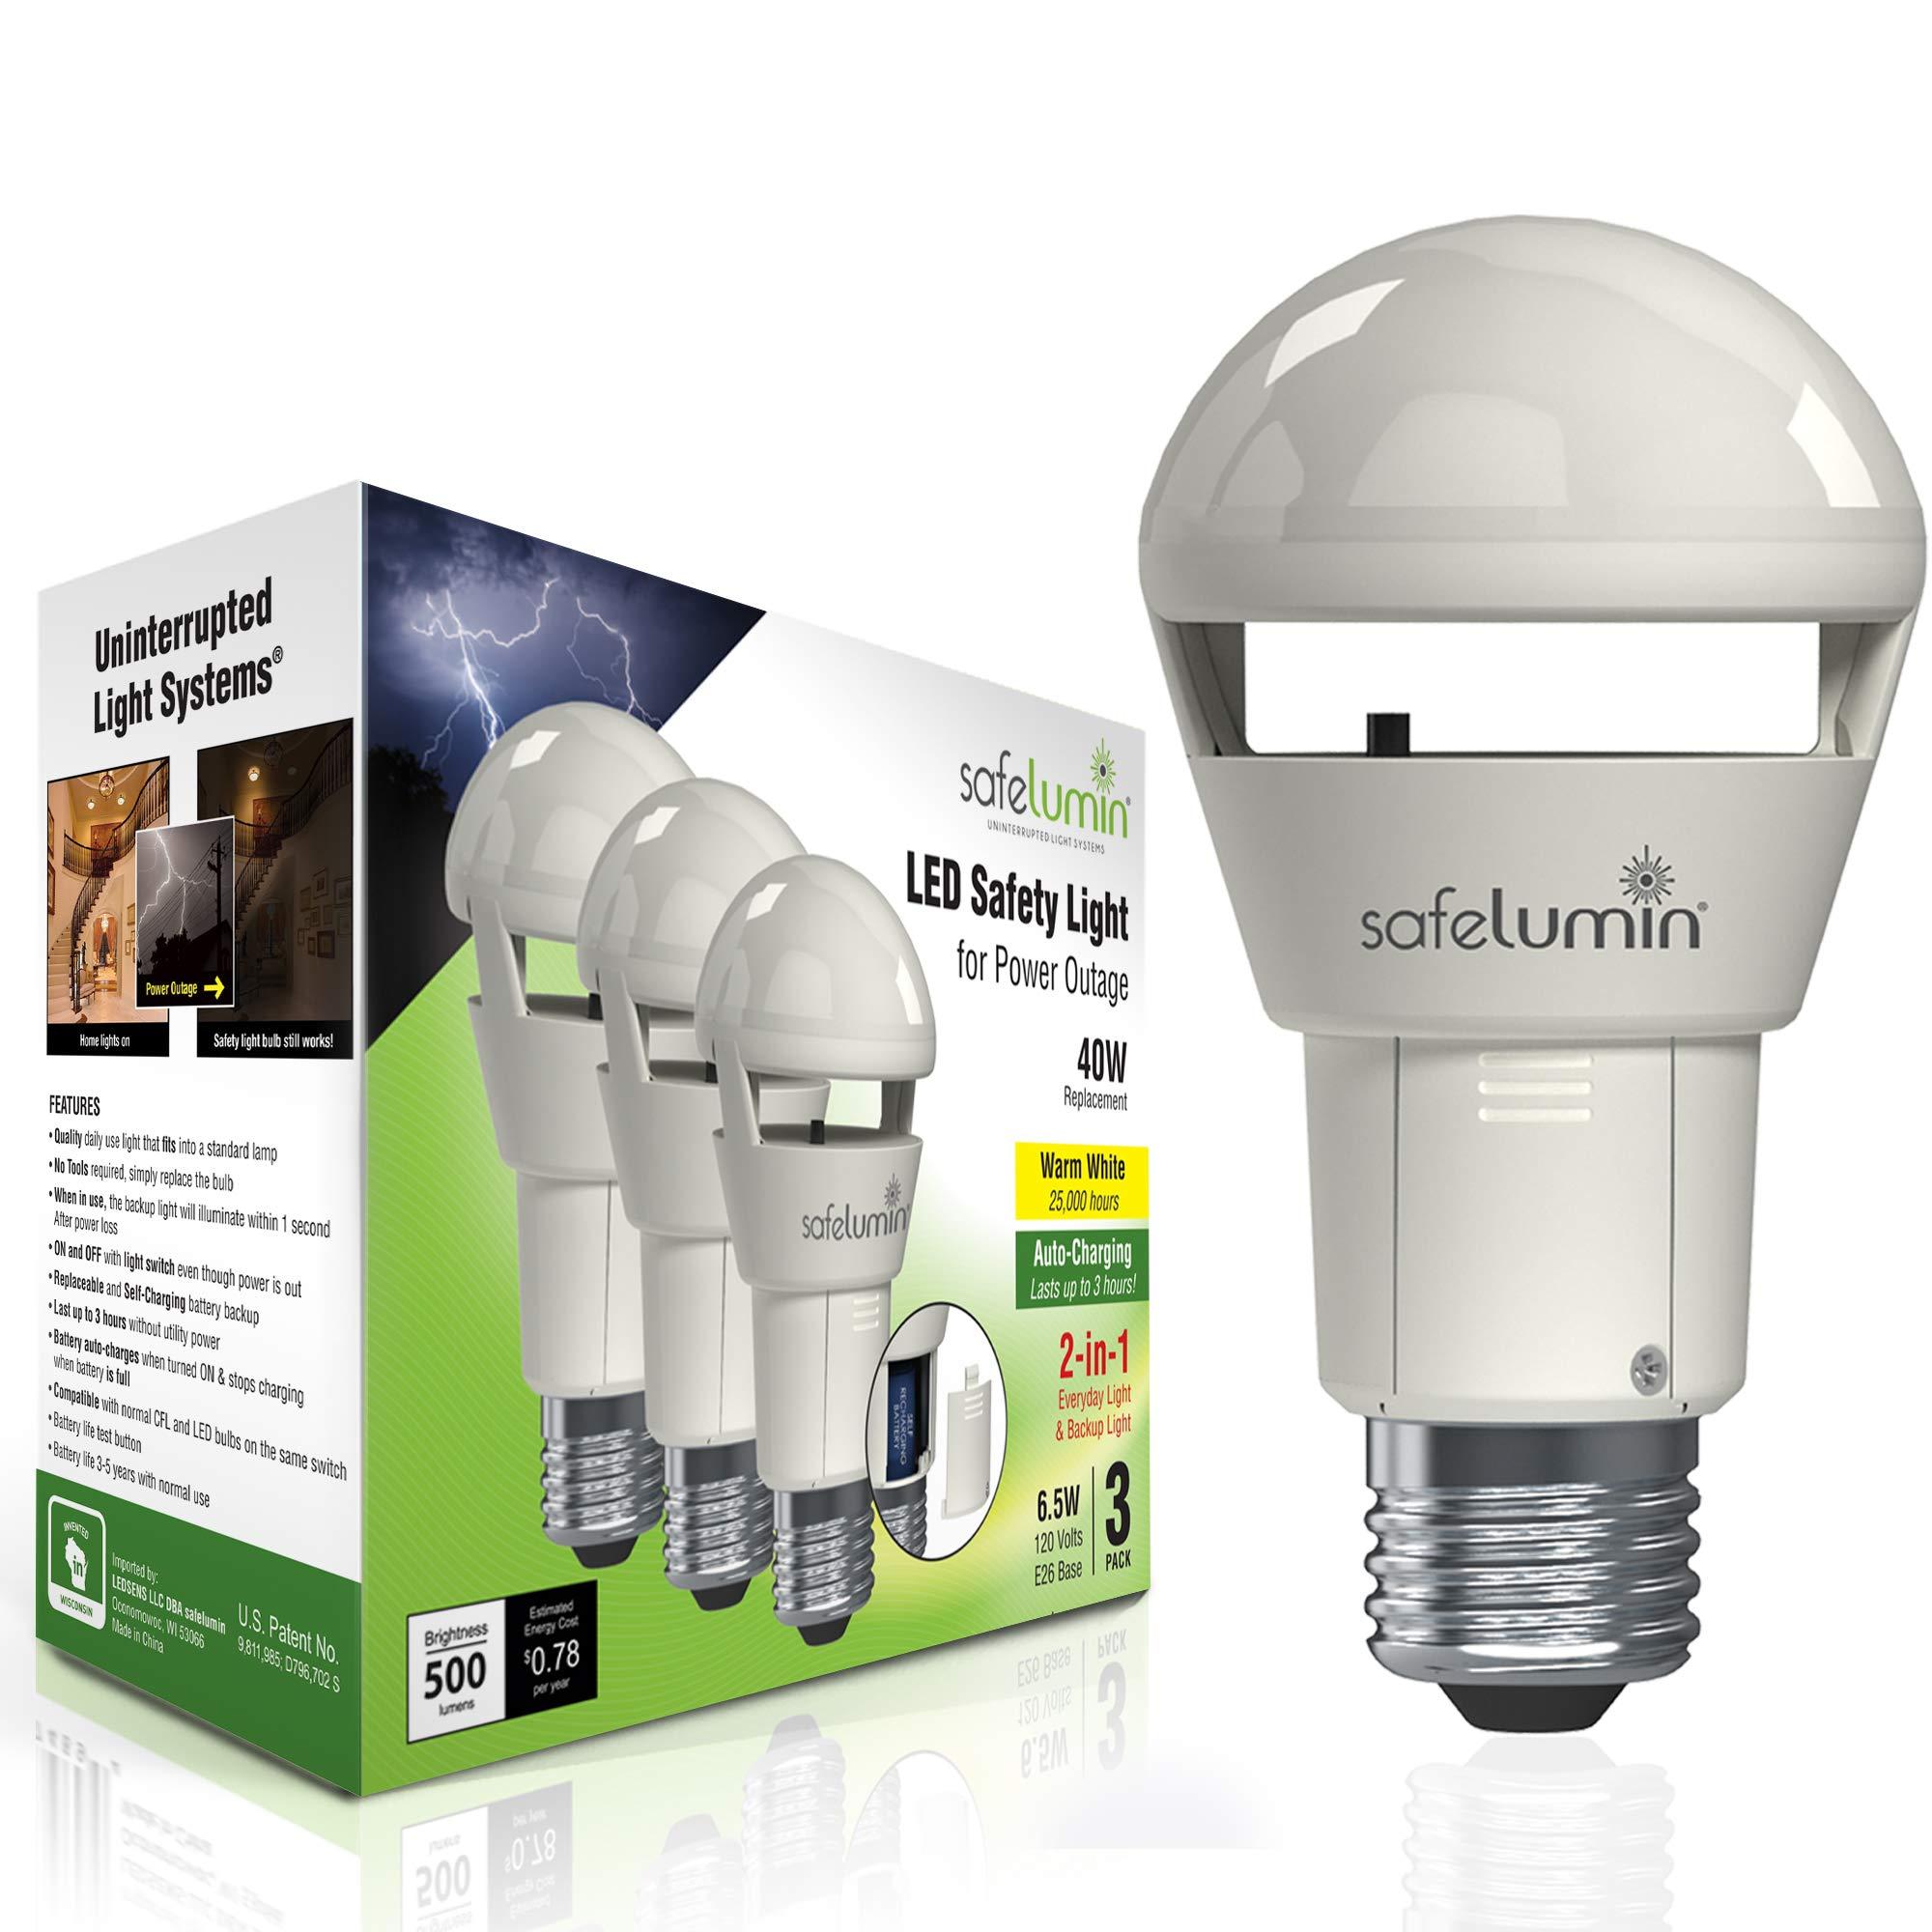 safelumin SA19-450U27 3PK Rechargeable Light Bulbs Warm White - Emergency Lights for Home Power Failure - Works as Normal Light Bulbs & 3Hrs Battery Backup, UL AC120V E26, 40W Equivalent 500lm